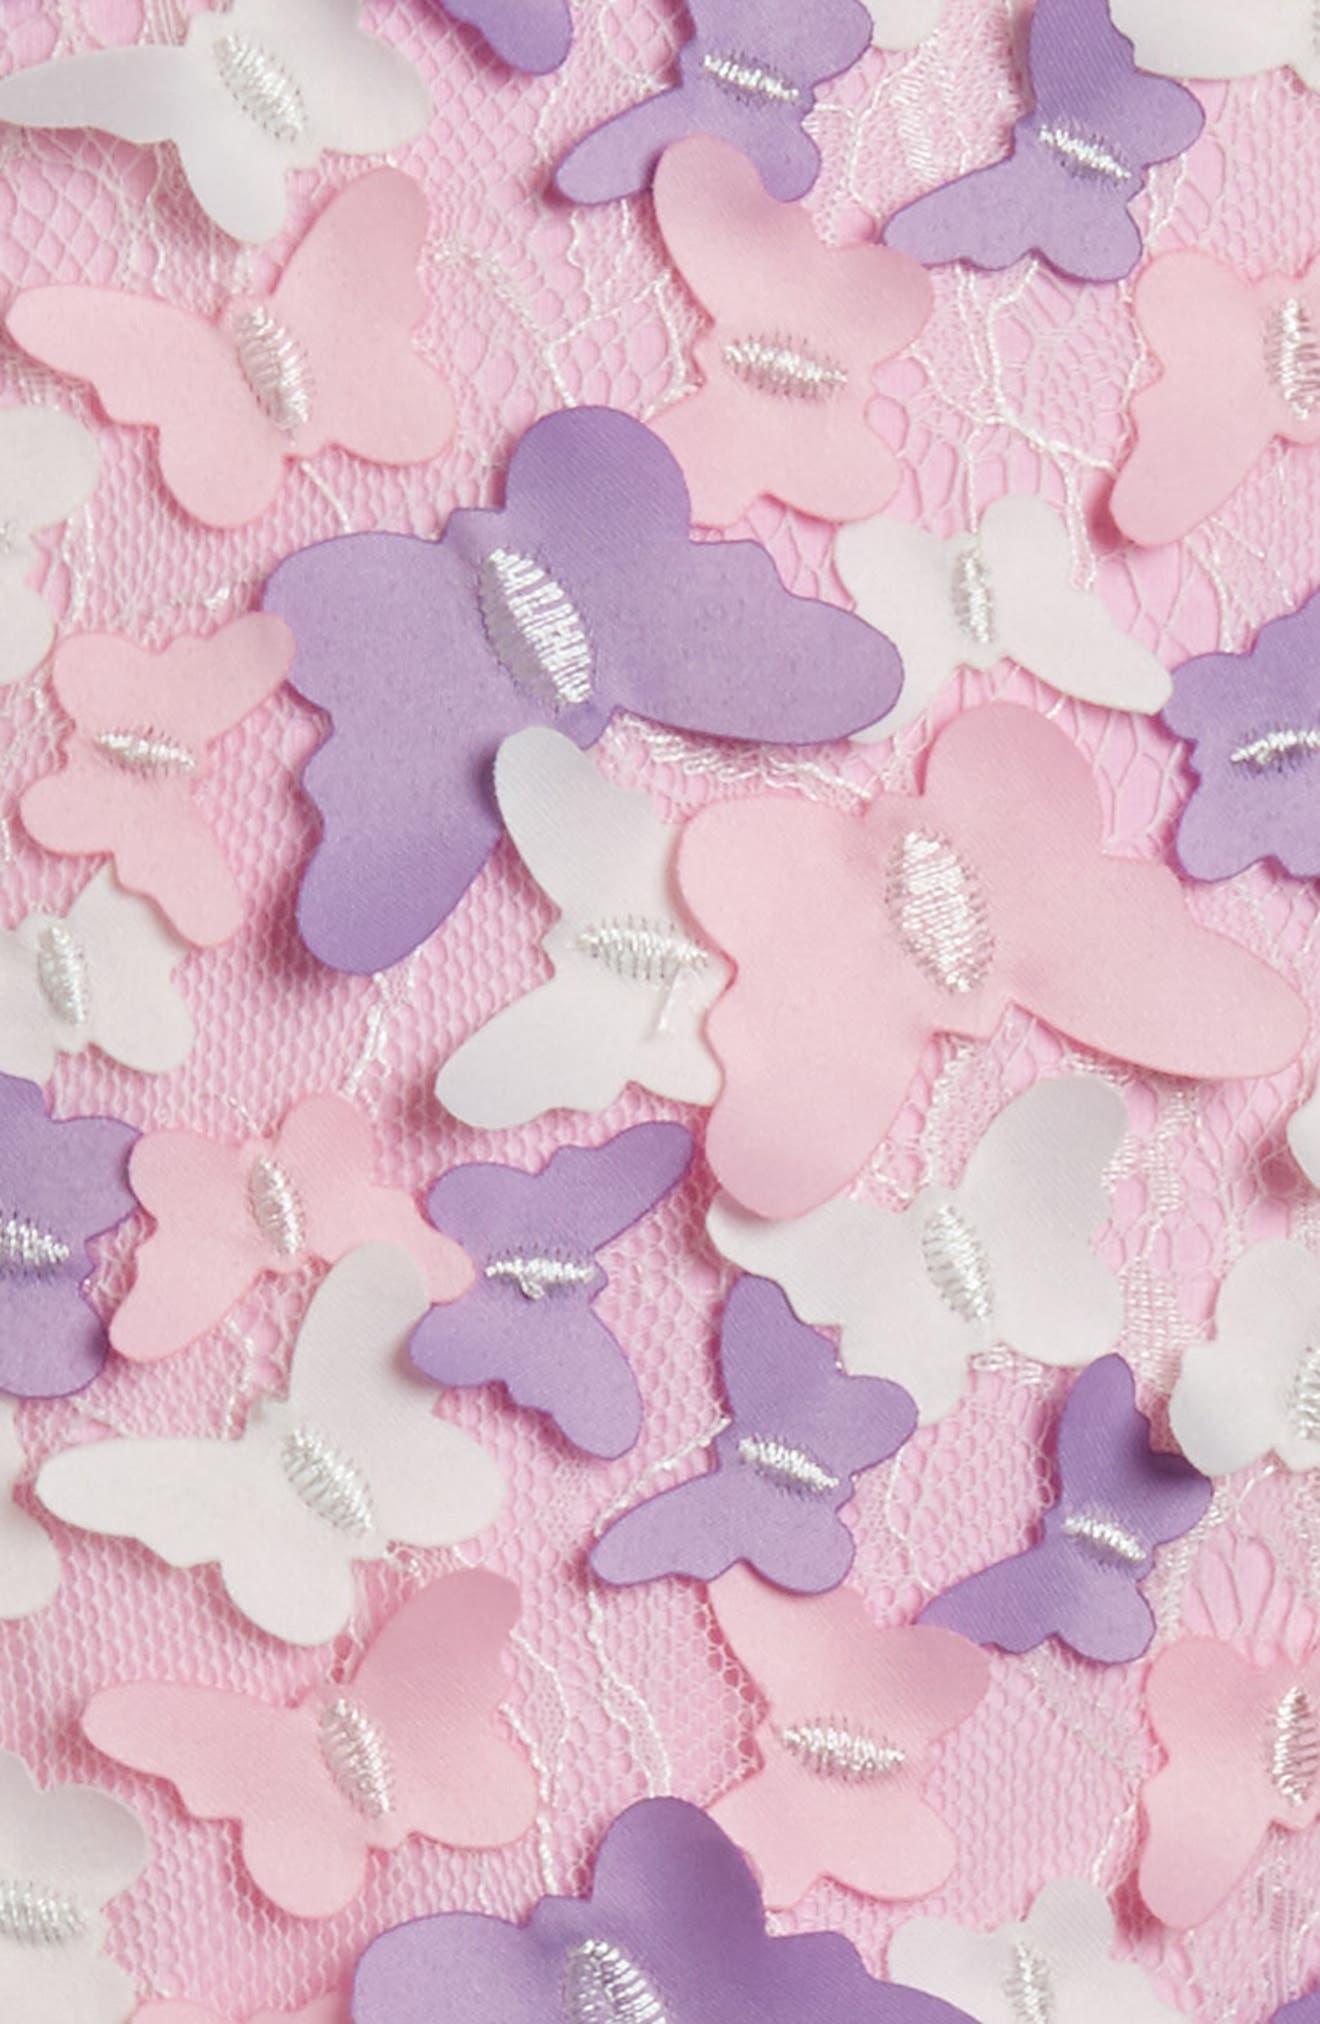 Butterfly Sleeveless Dress,                             Alternate thumbnail 3, color,                             Pink/ Purple Multi